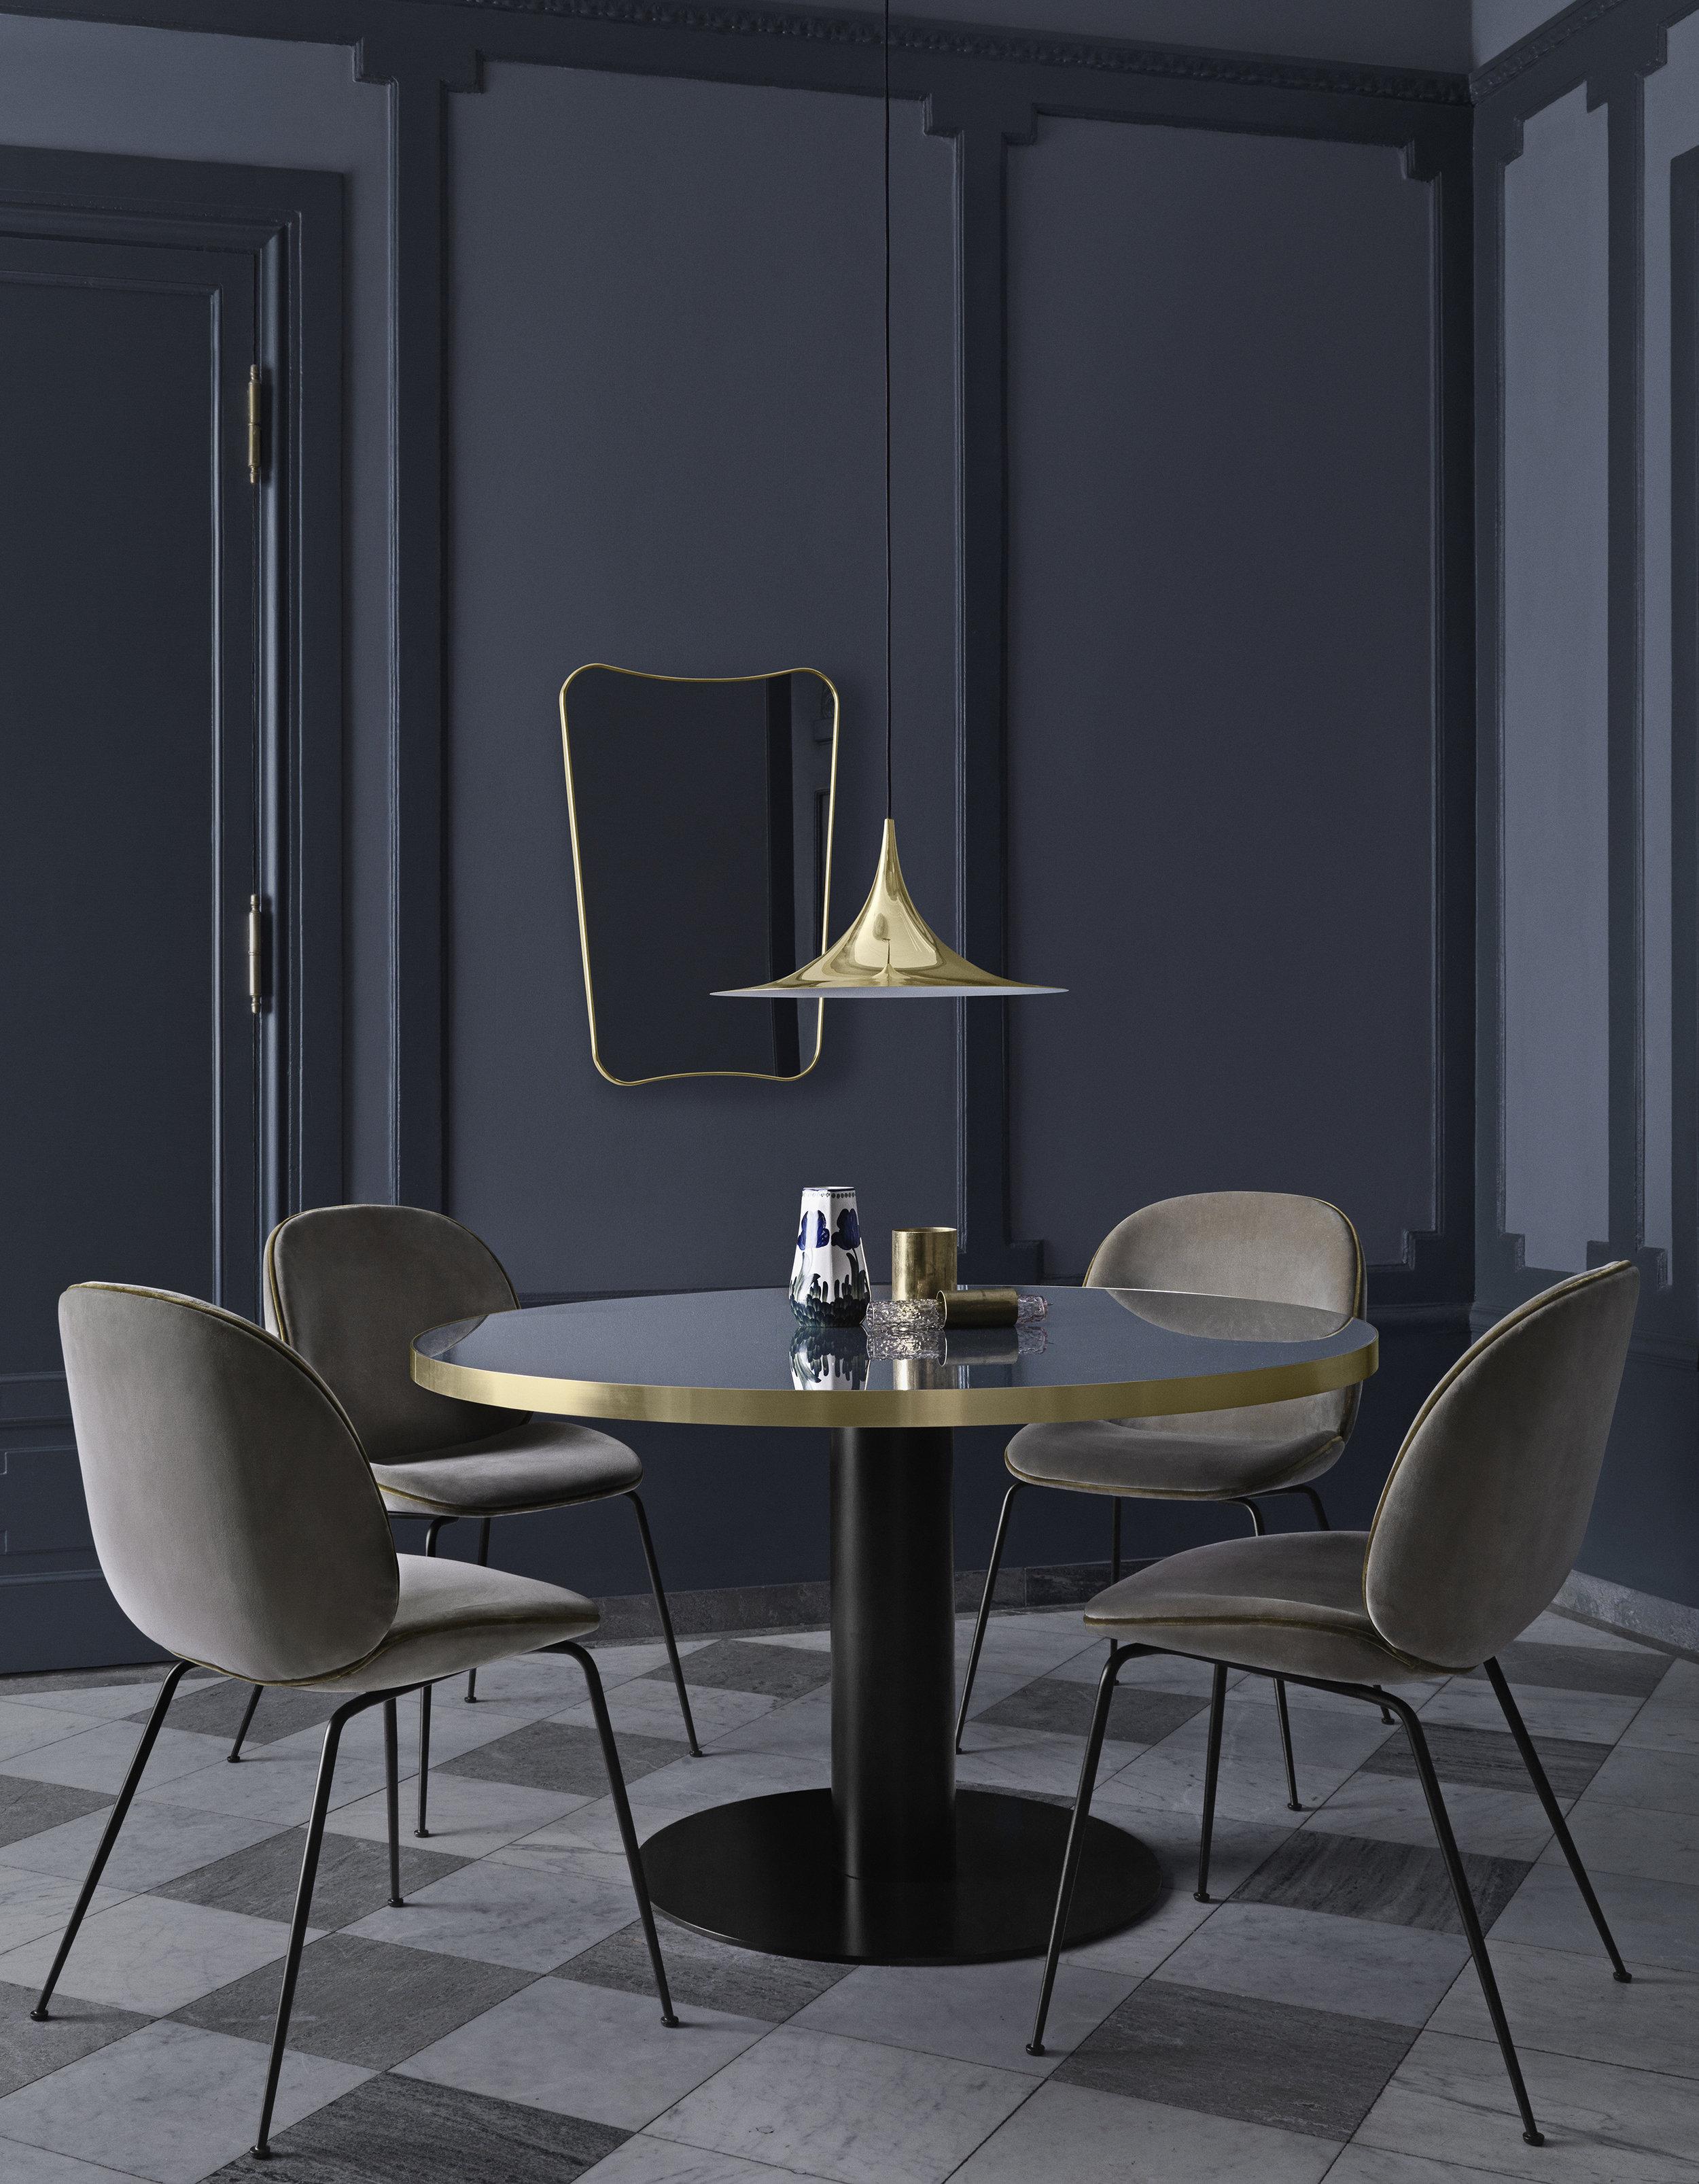 Beetle chair - Velluto di Cotone 294, piping 1180_Gubi table 2.0 - granite grey_Semi pendant Ï47- brass_F.A. 33 mirror.jpg